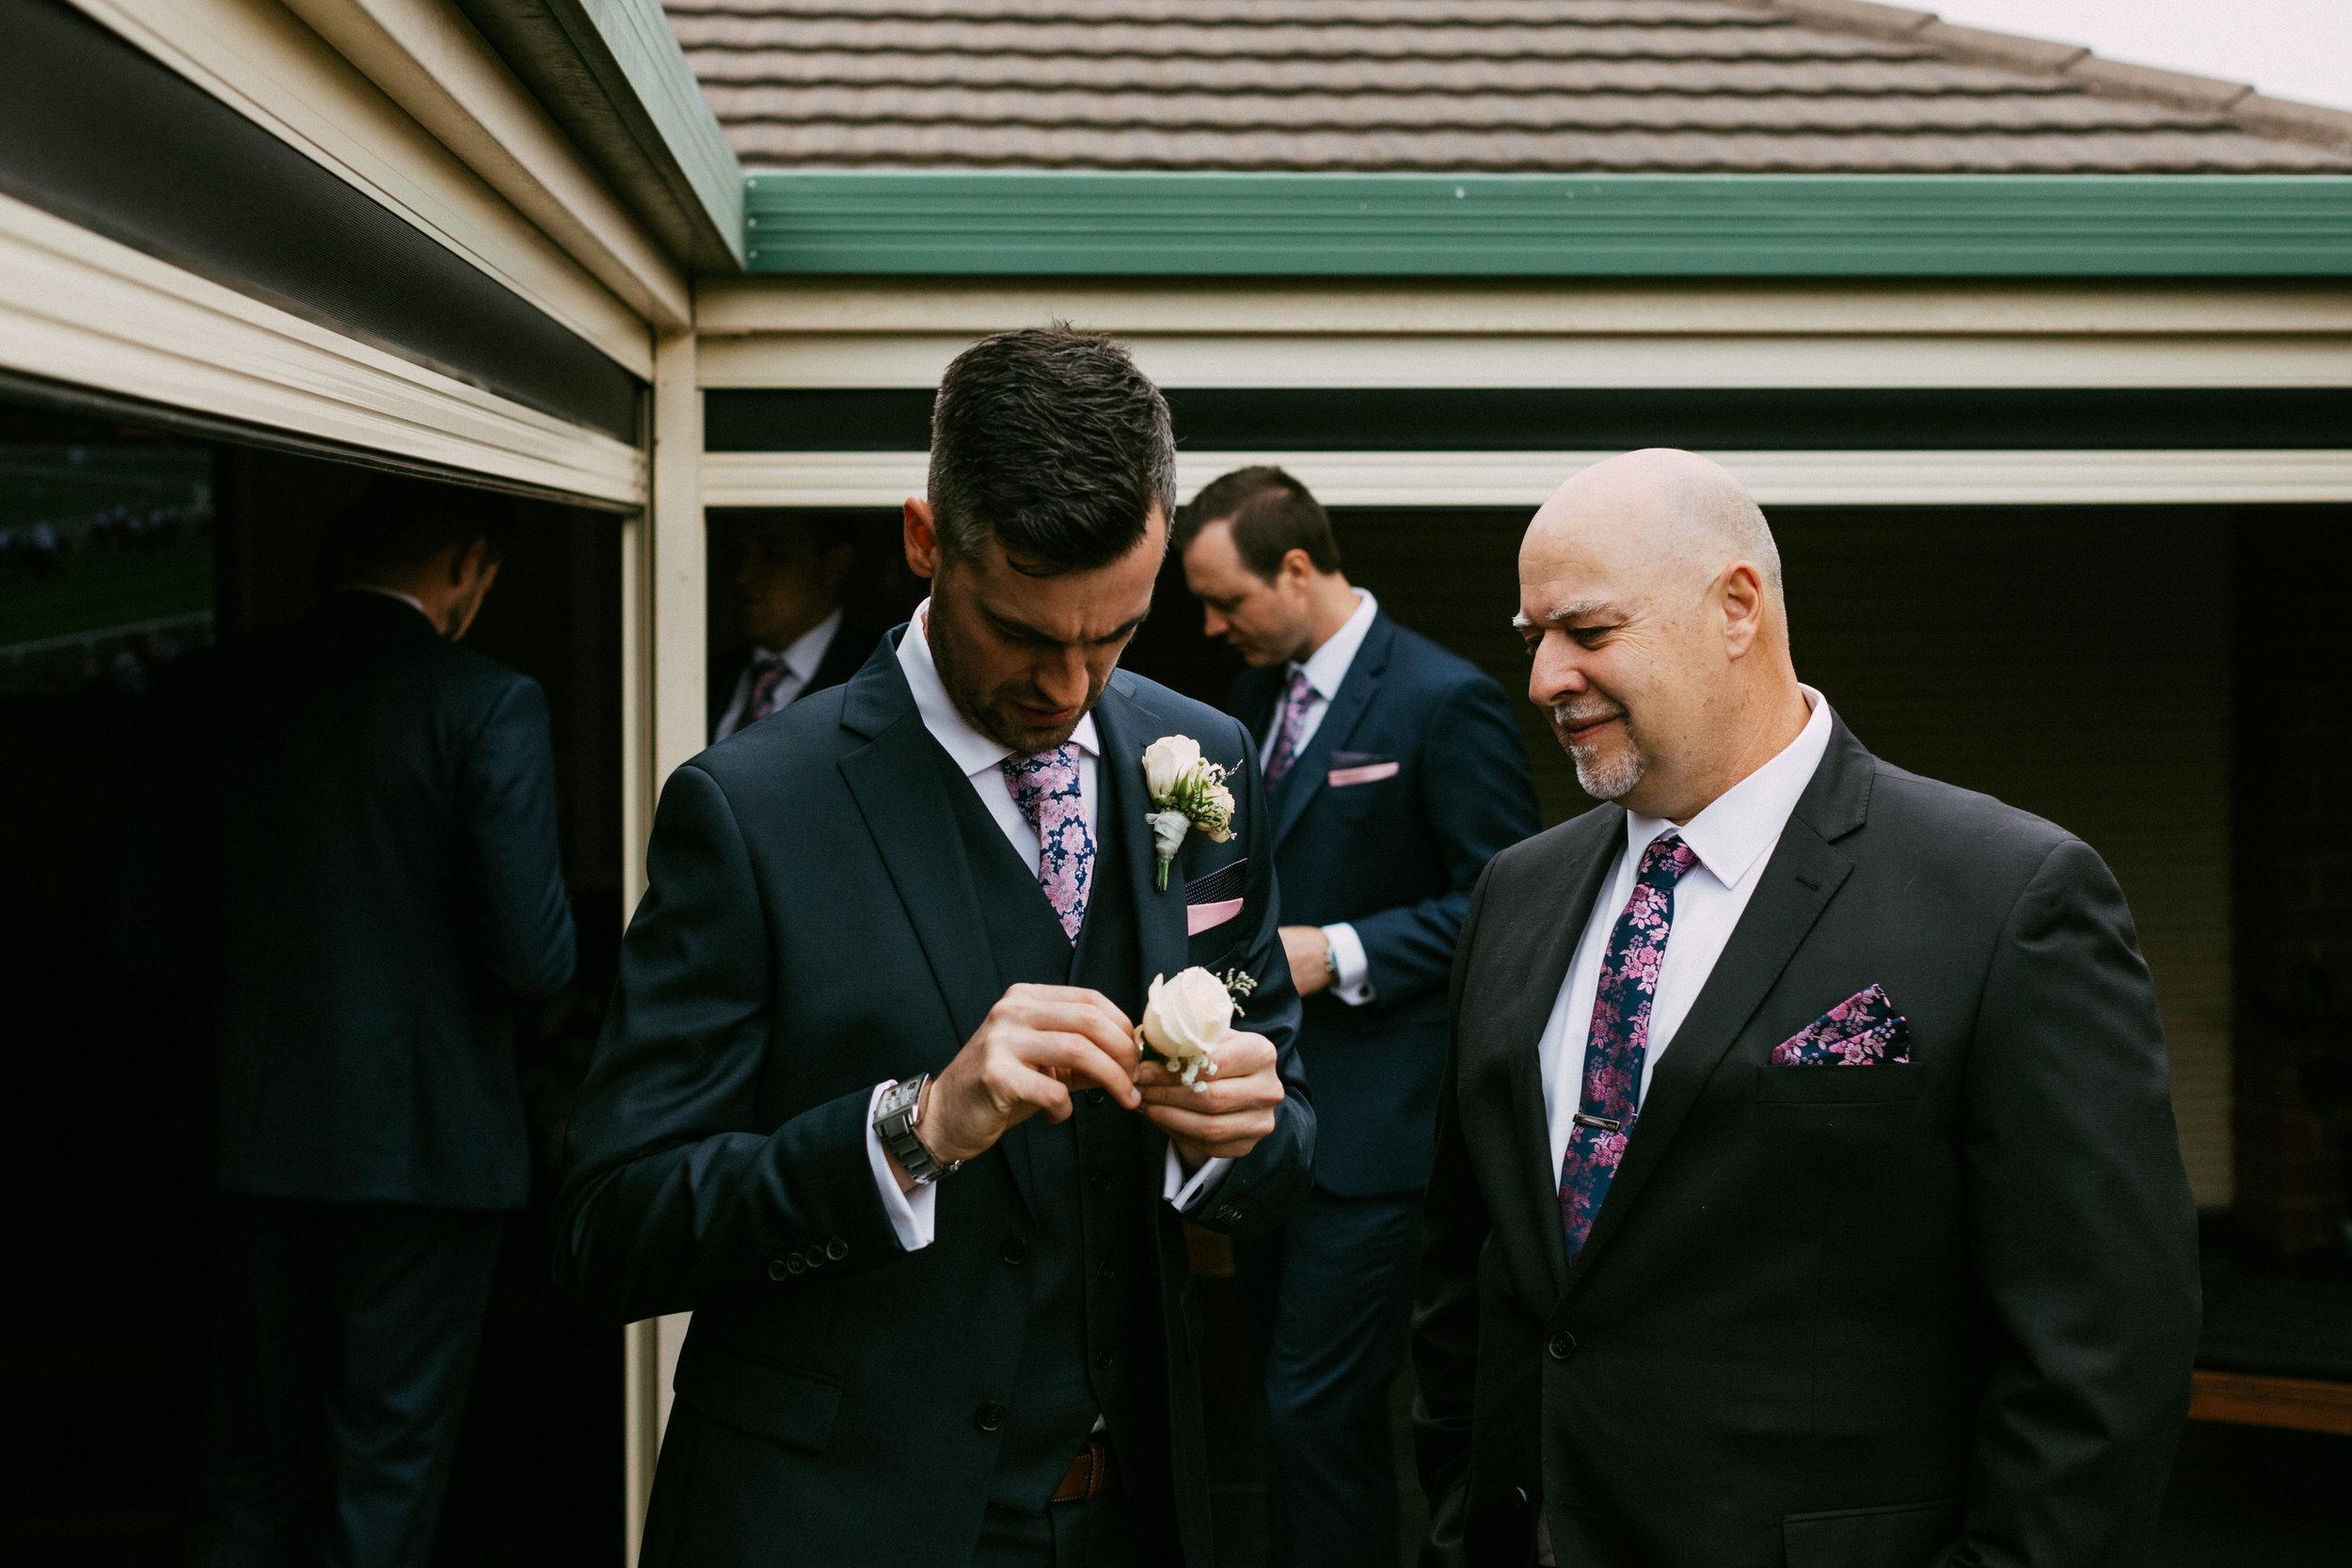 McLaren Vale Adelaide Wedding 007.jpg